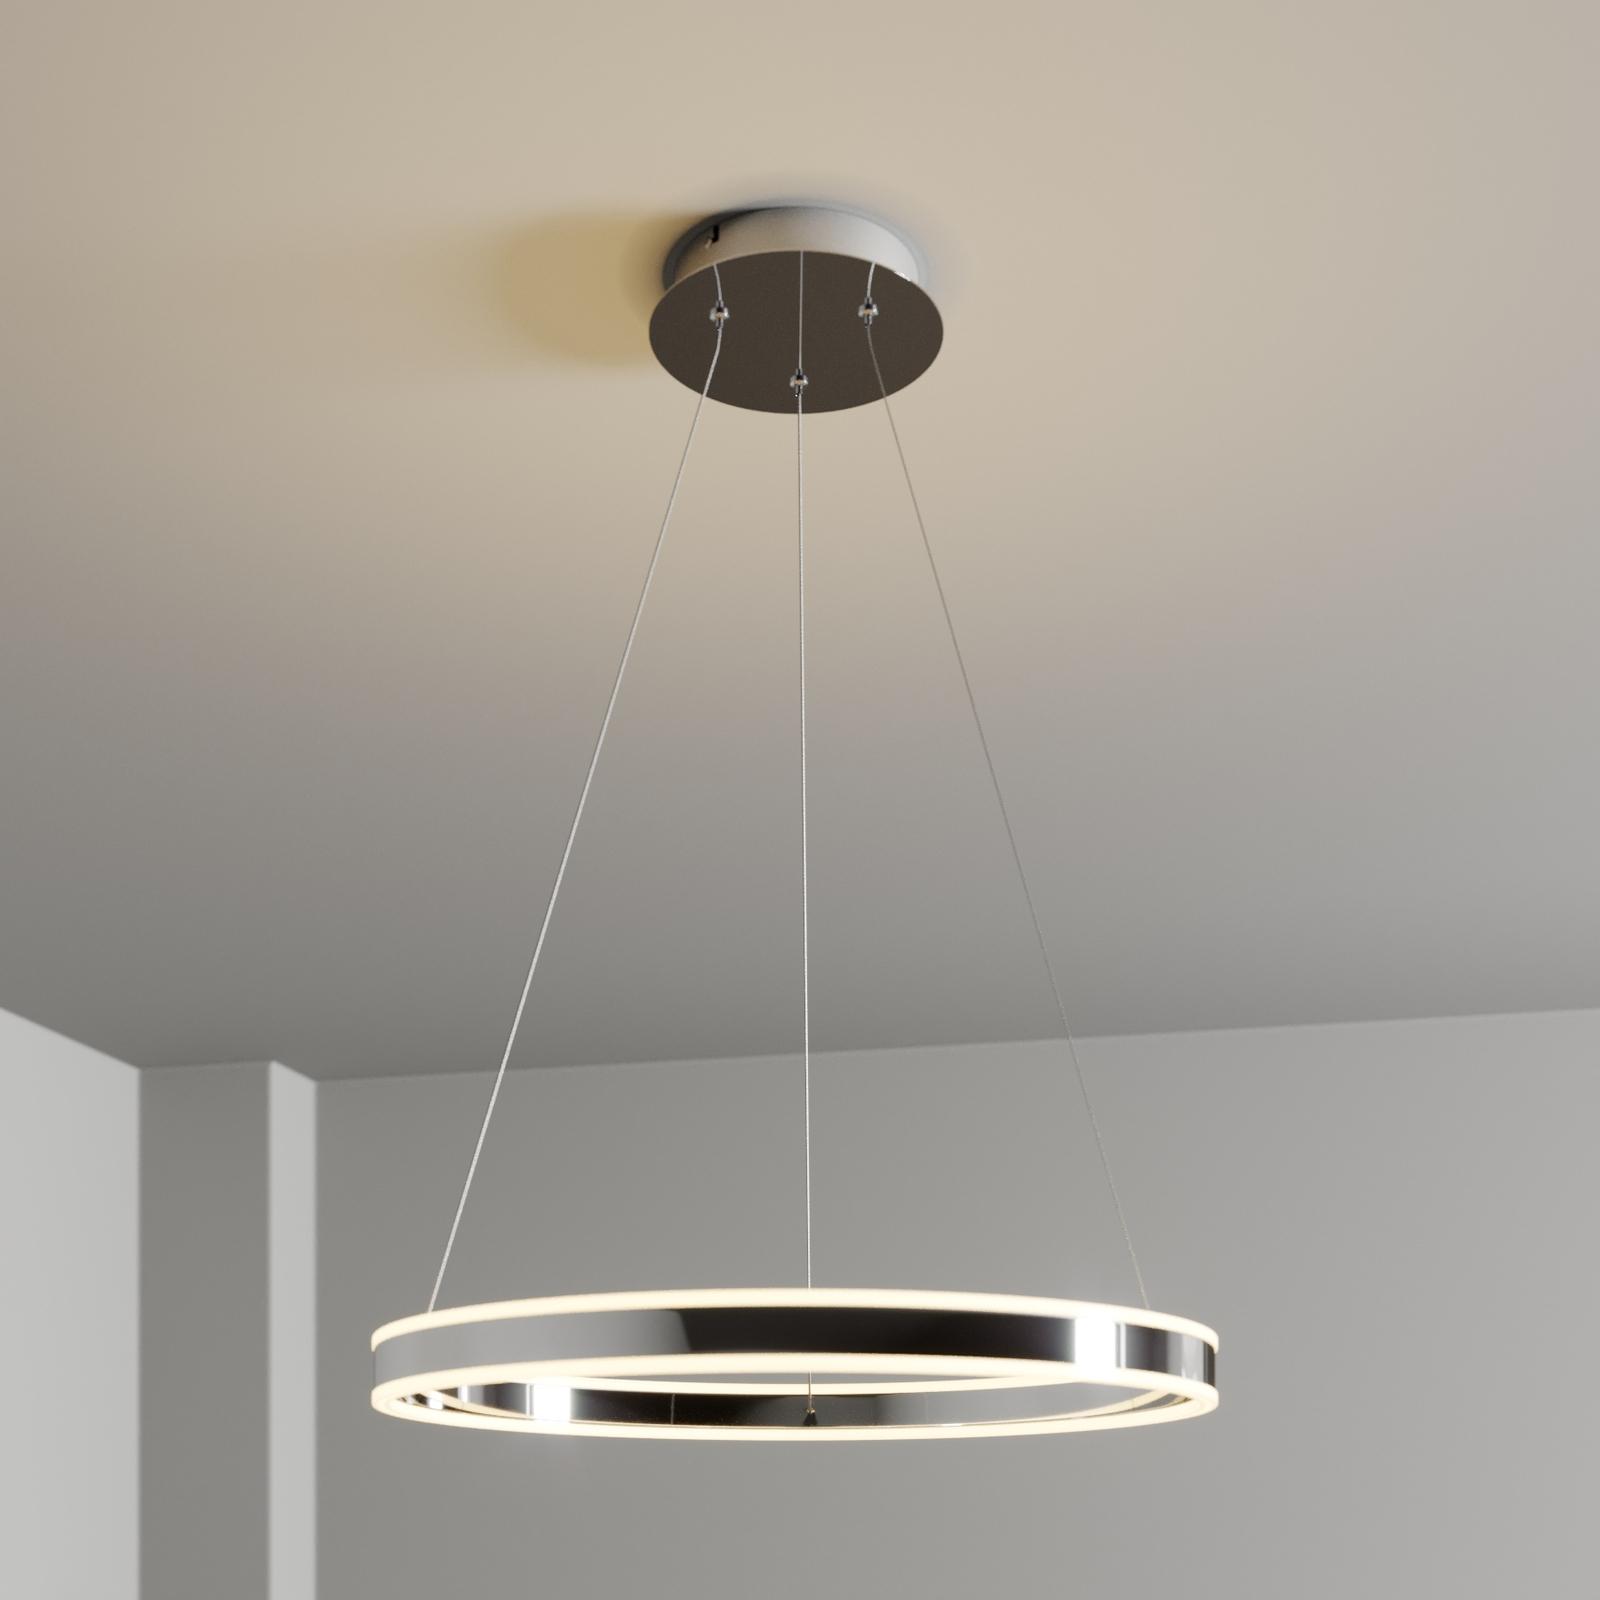 Lámpara colgante LED Lyani cromo atenuable, 60 cm